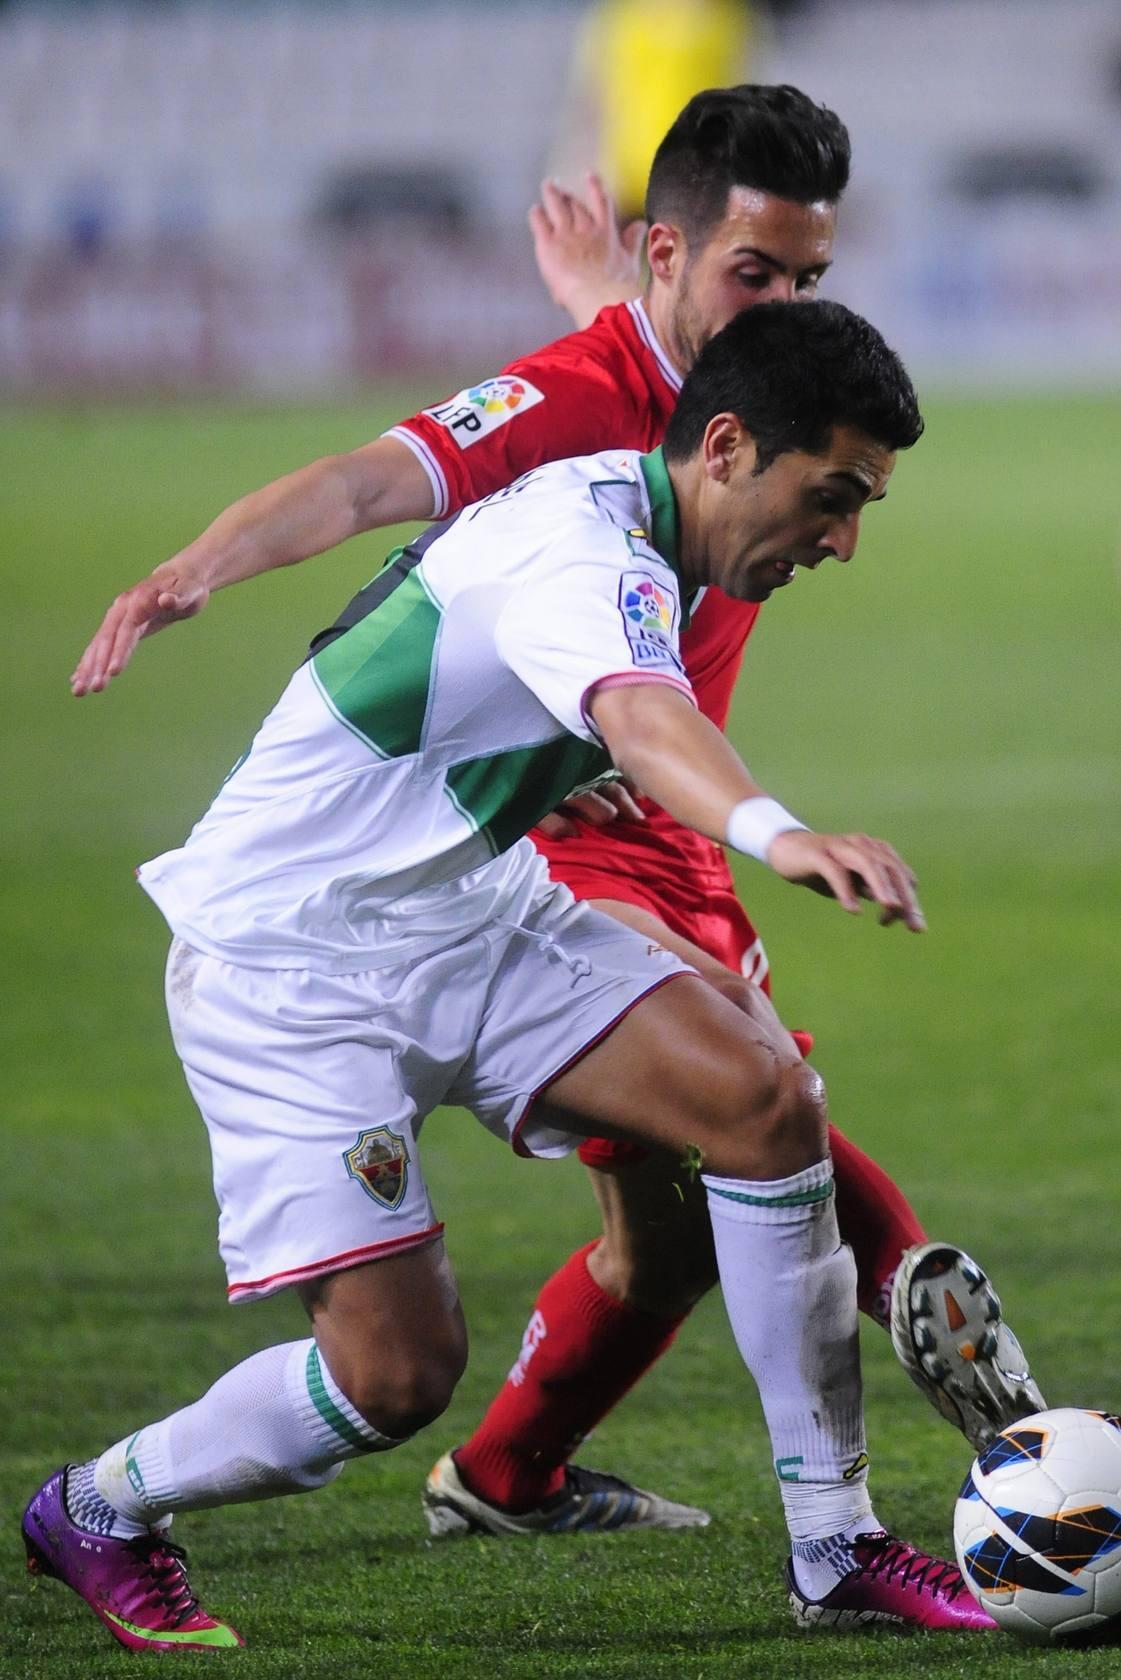 Elche - Real Murcia (1-0)